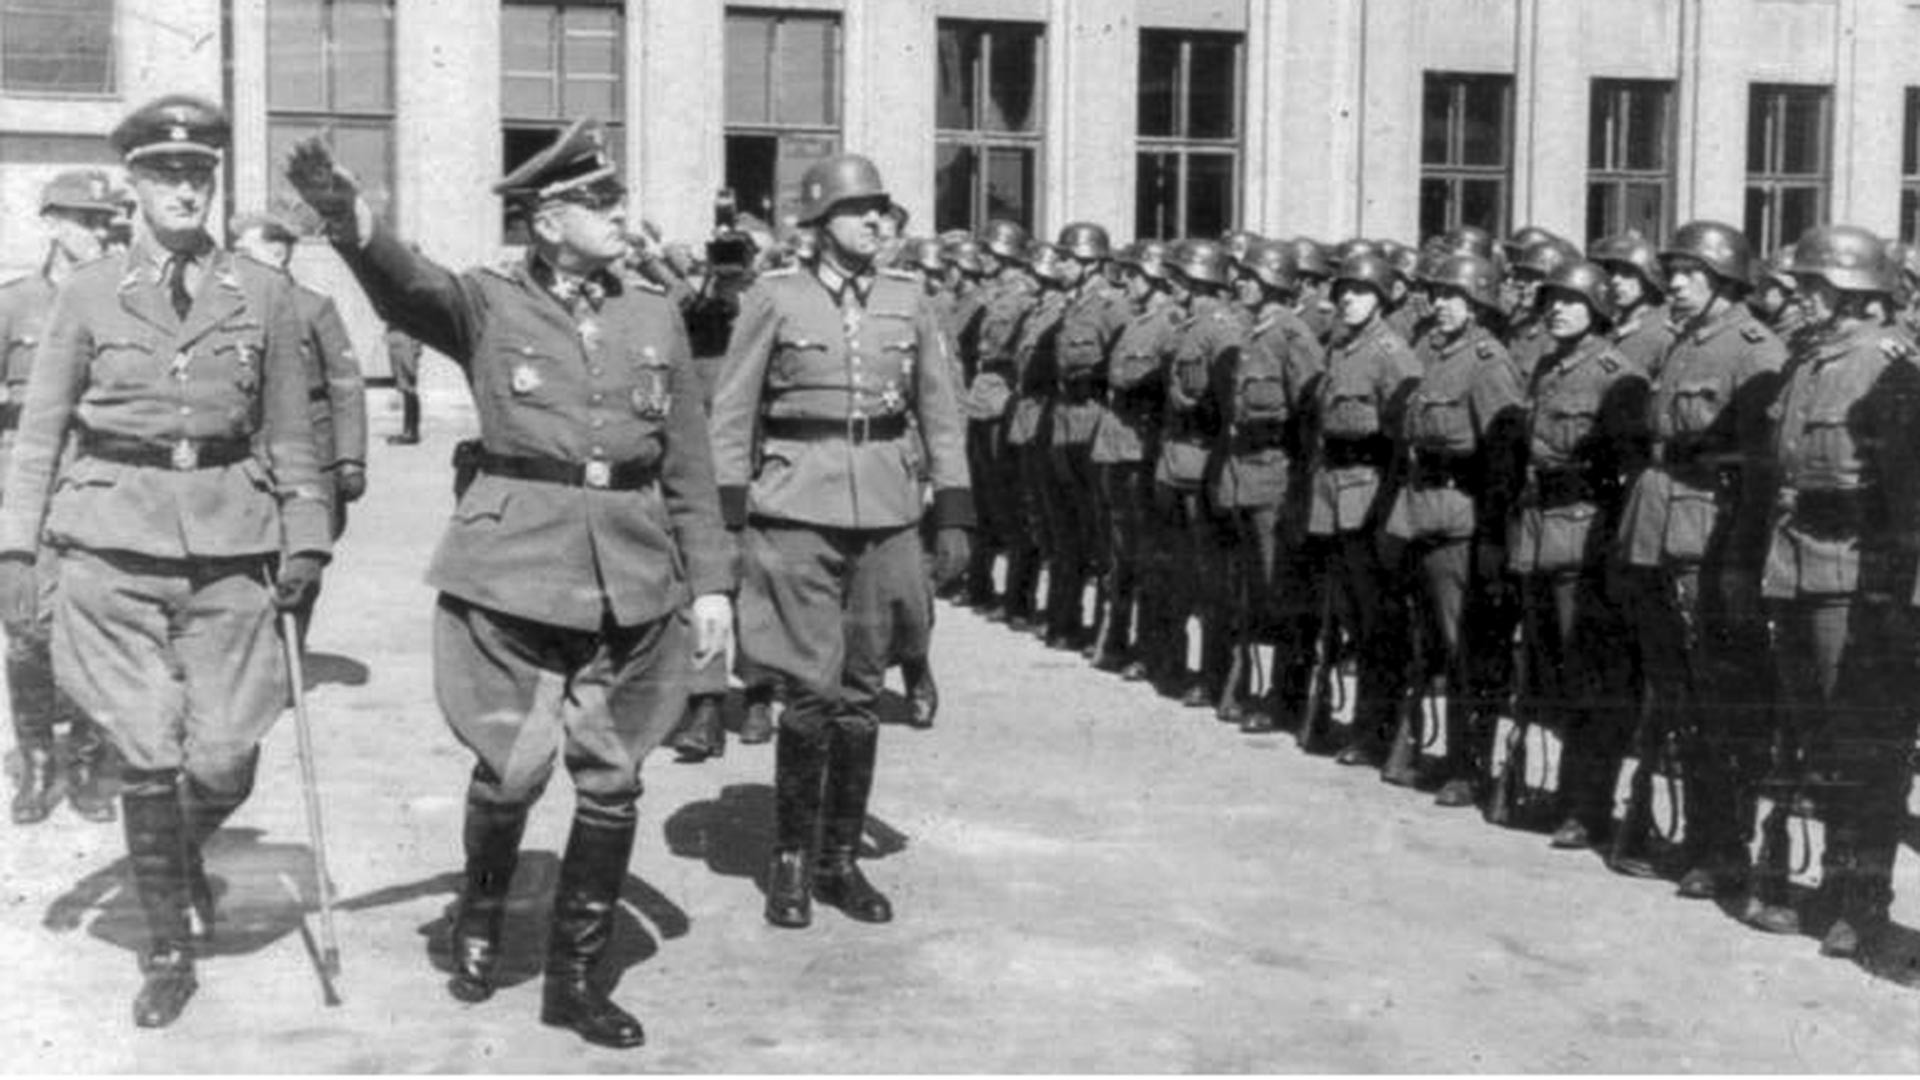 SS-Obergruppenführer in policijski general Erich von dem Bach-Zelewski na paradi v okupiranem Minsku